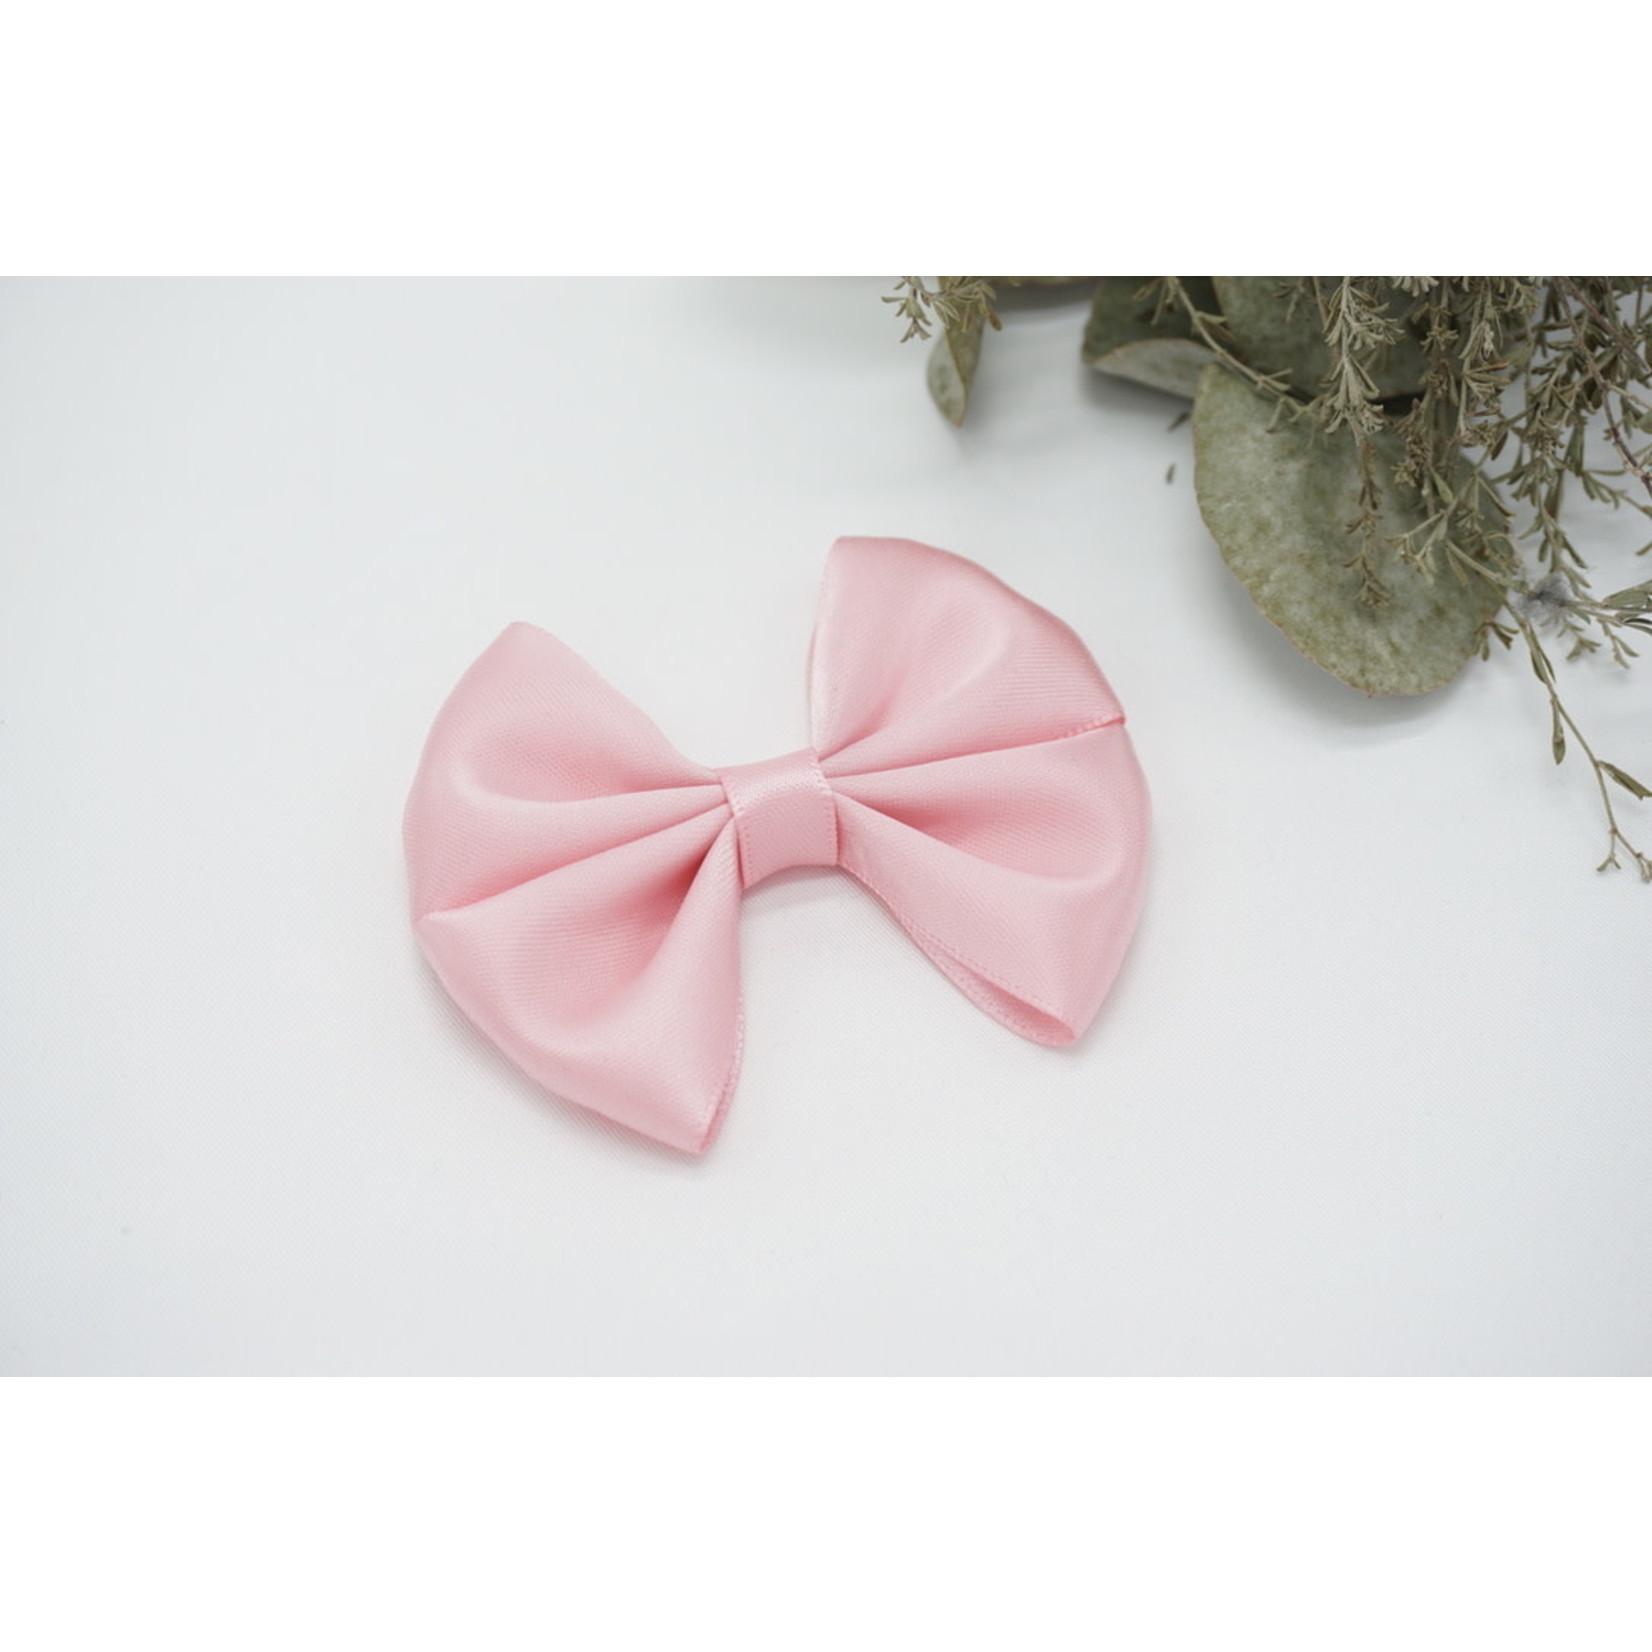 Petite Zara Satin Bow - Pink